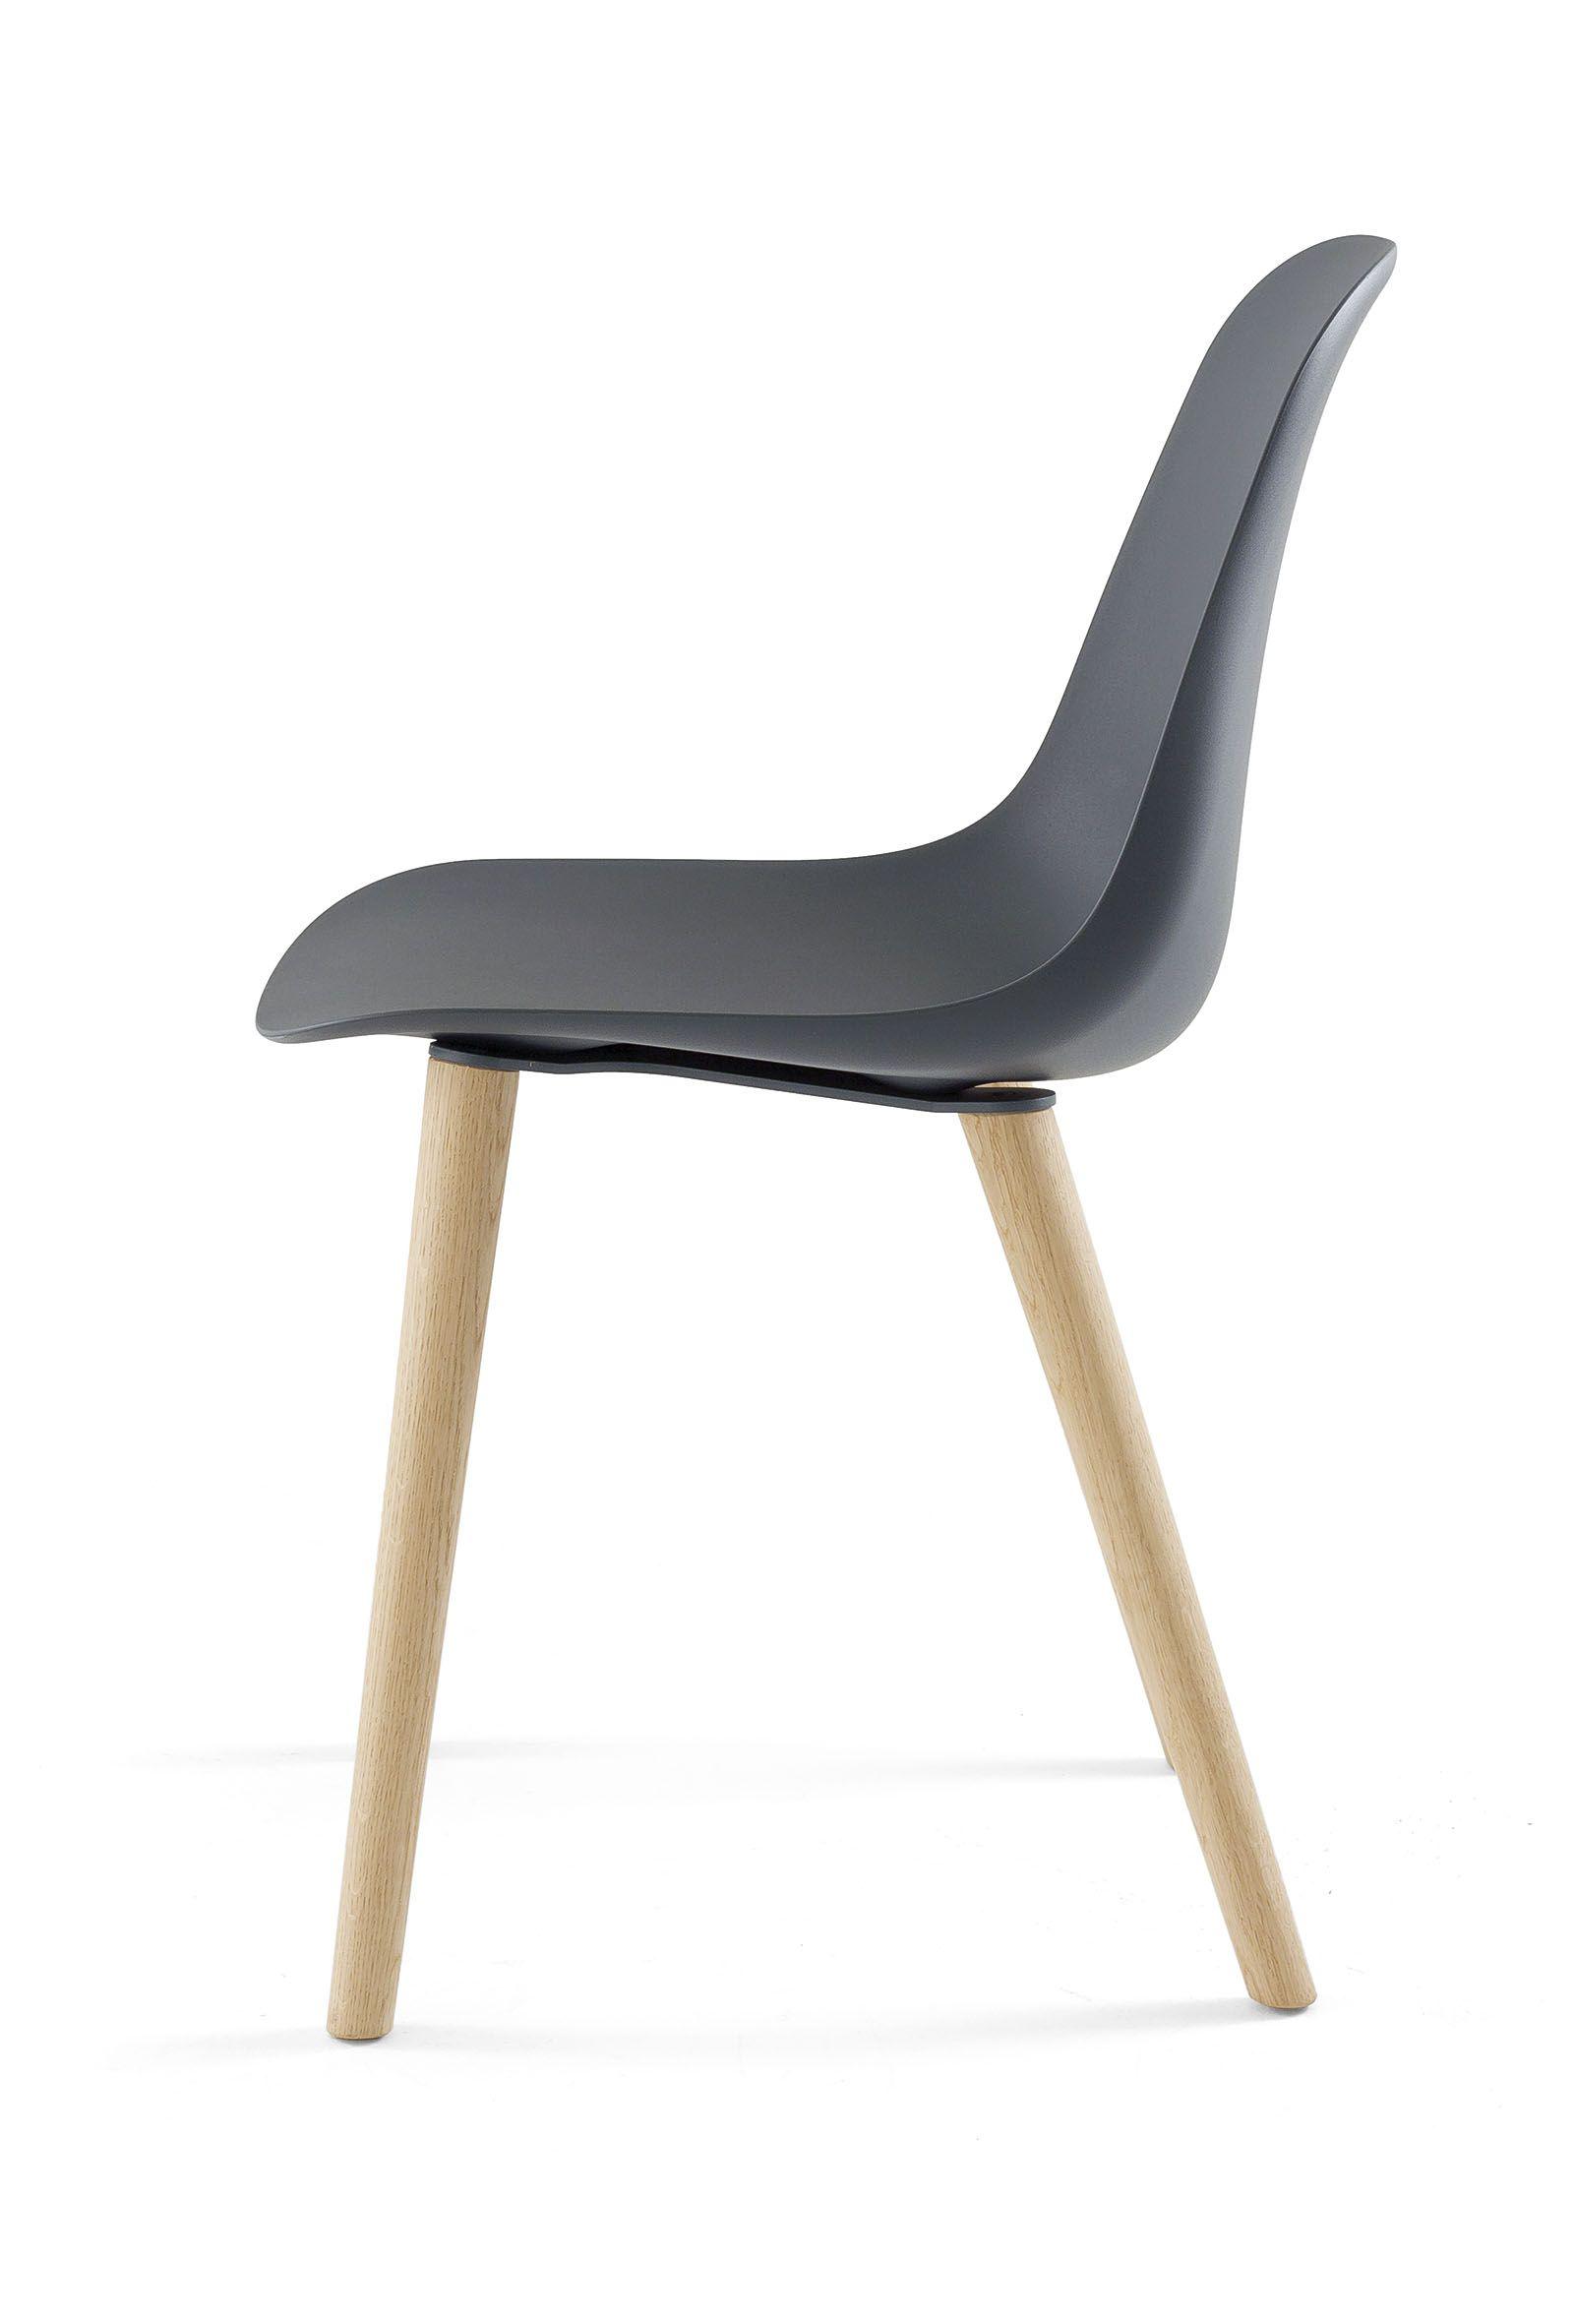 Chair POLA R 4W Pola Collection by Crassevig